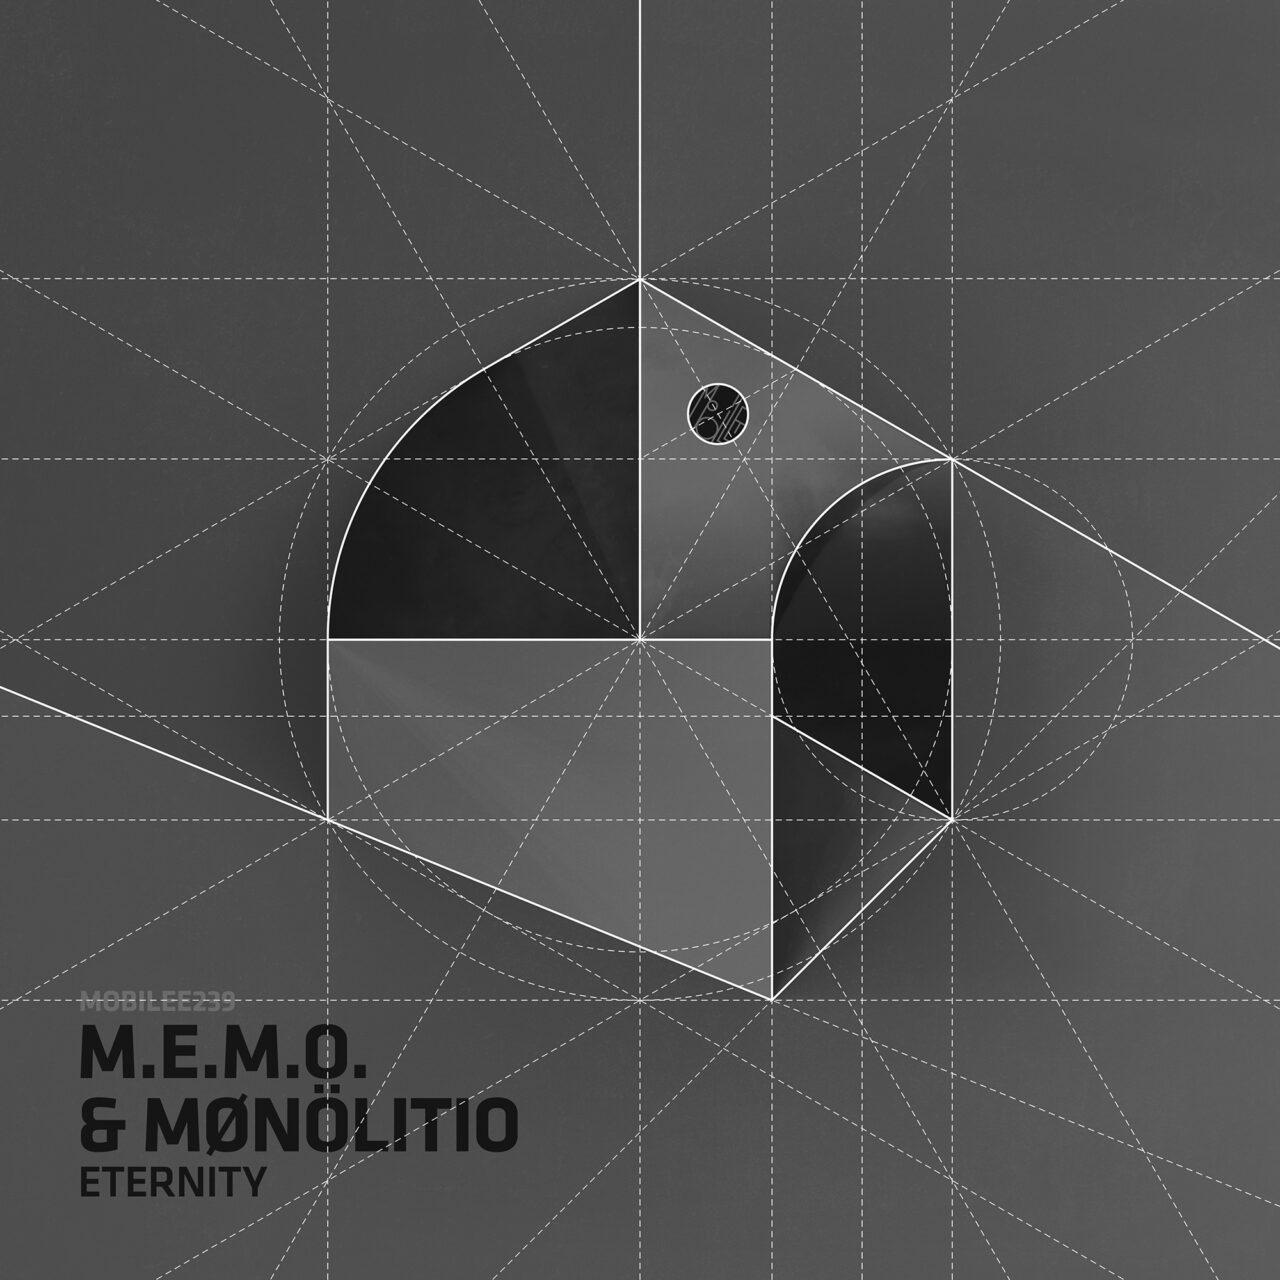 Mobilee239_M.E.M.O.&Mønölitio_Eternity_construction_small